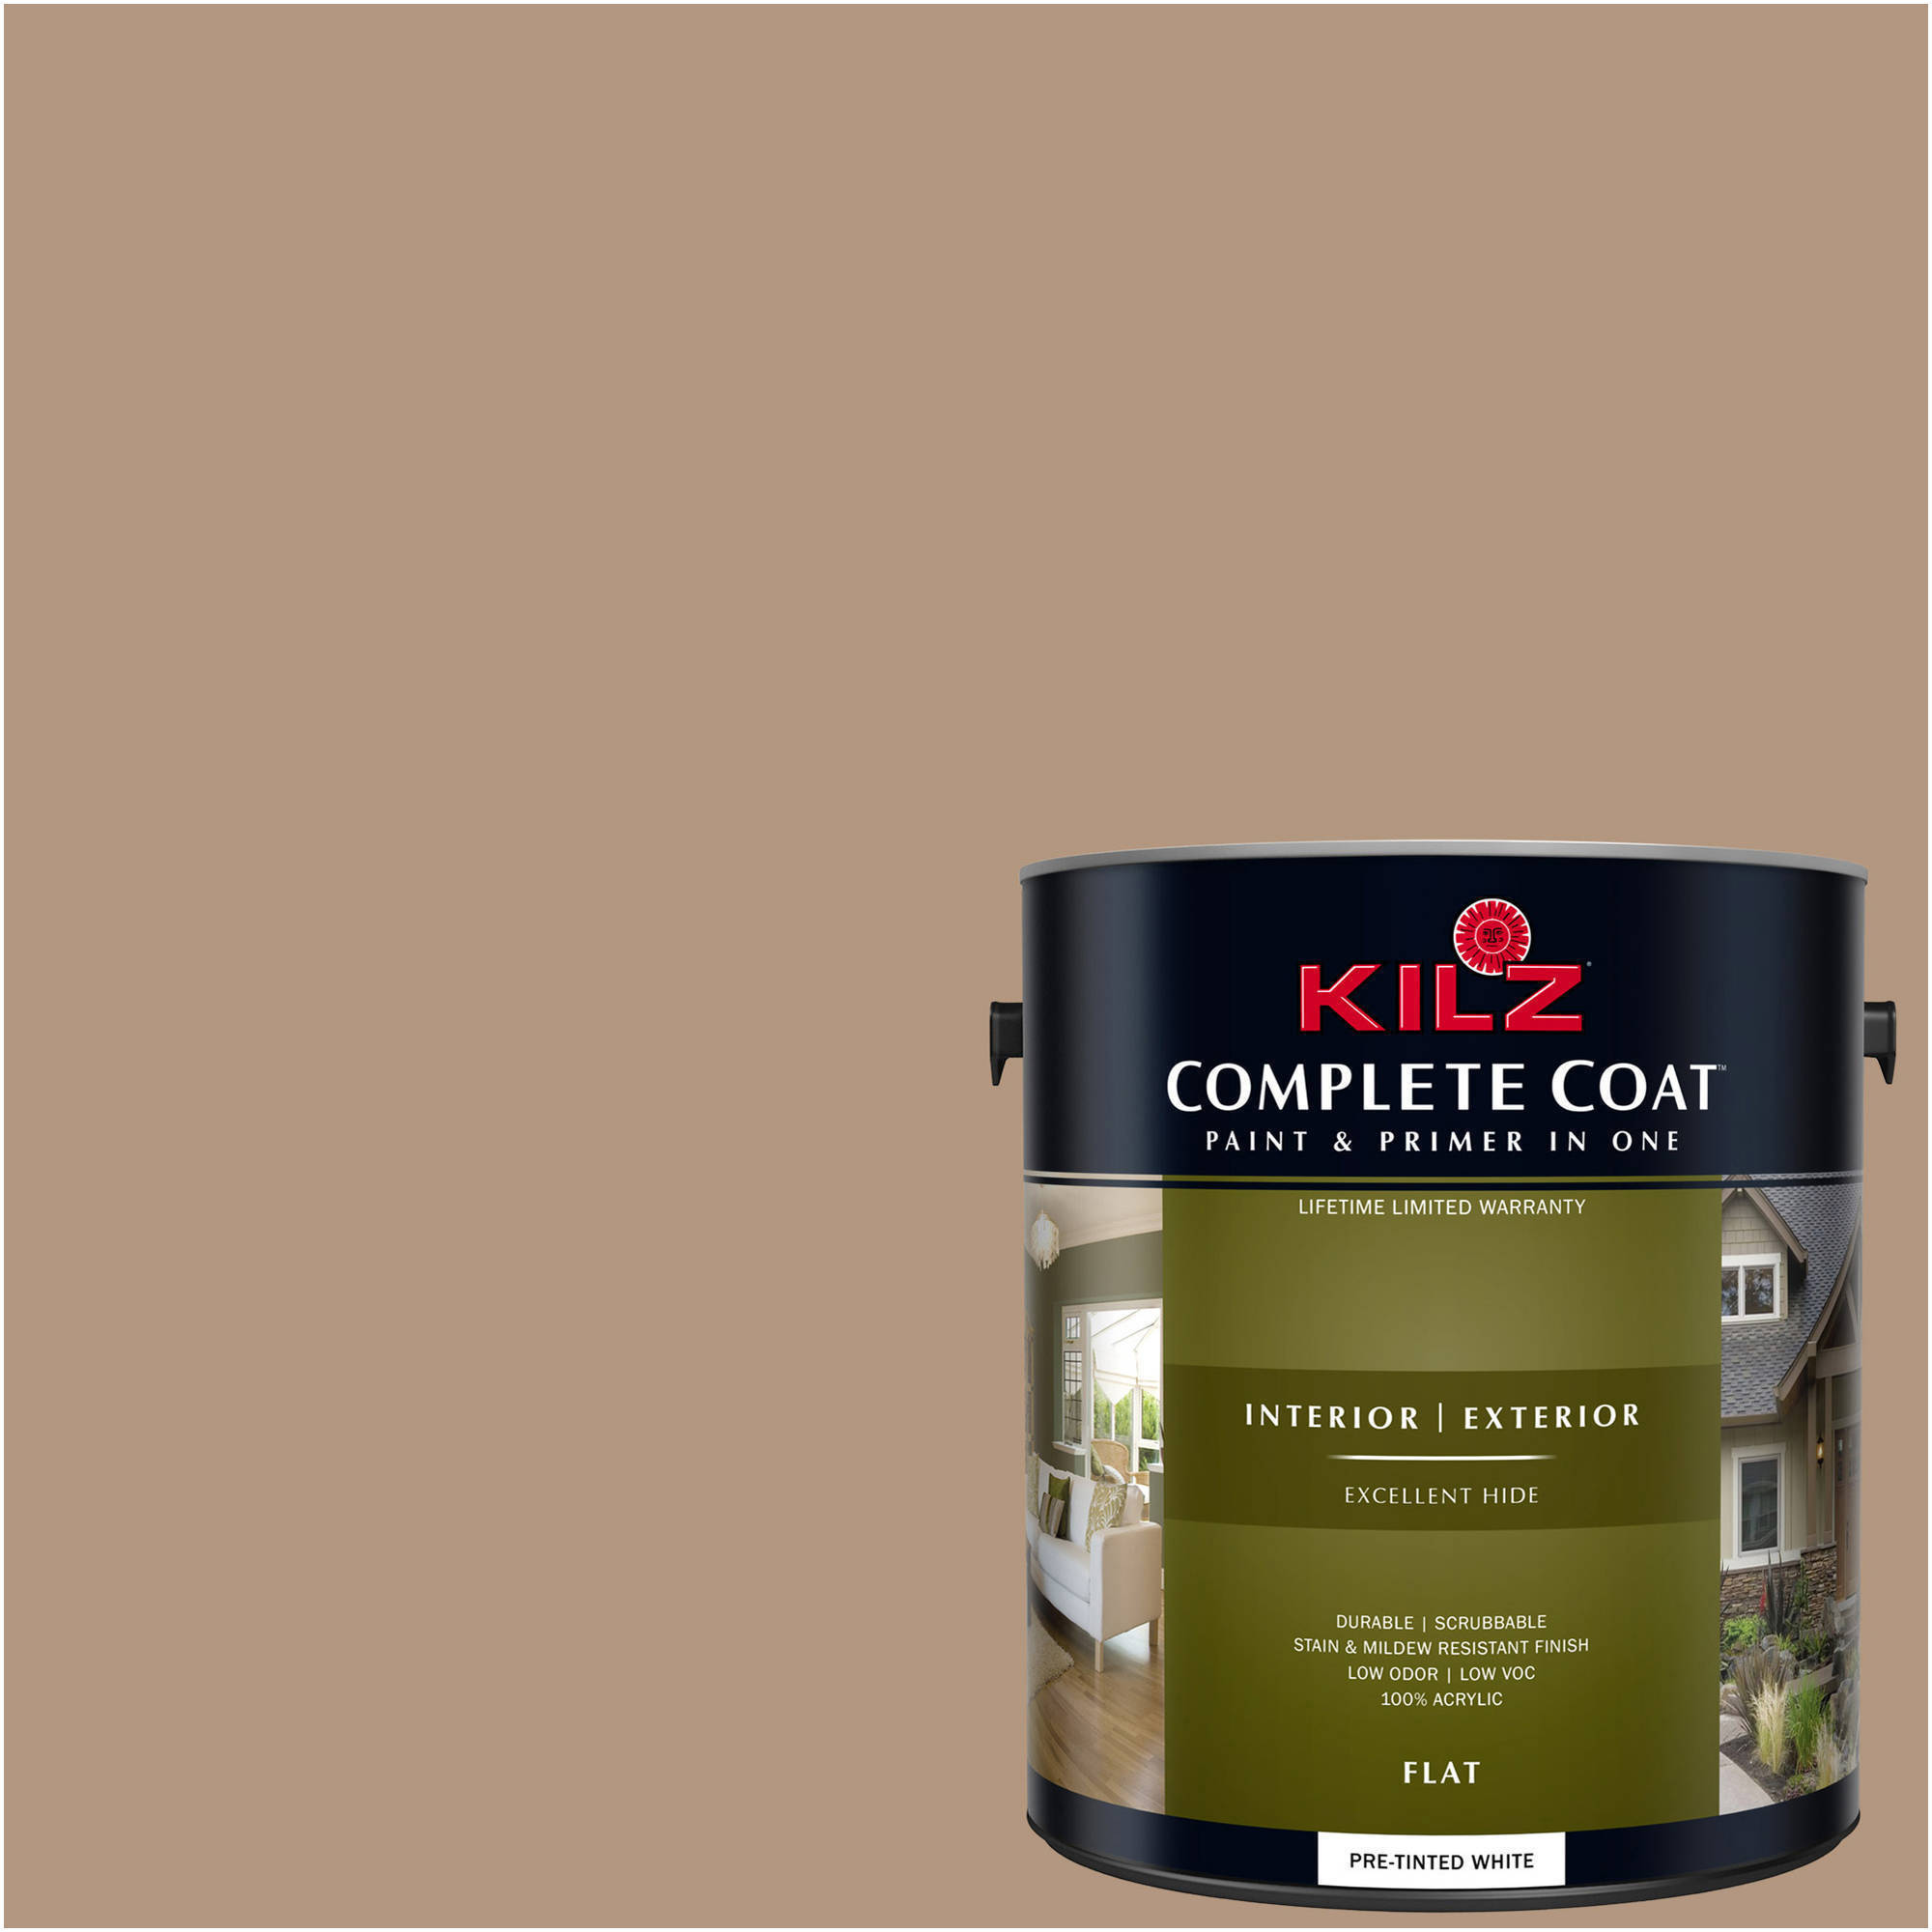 KILZ COMPLETE COAT Interior/Exterior Paint & Primer in One #LC250-01 Coffee Cake